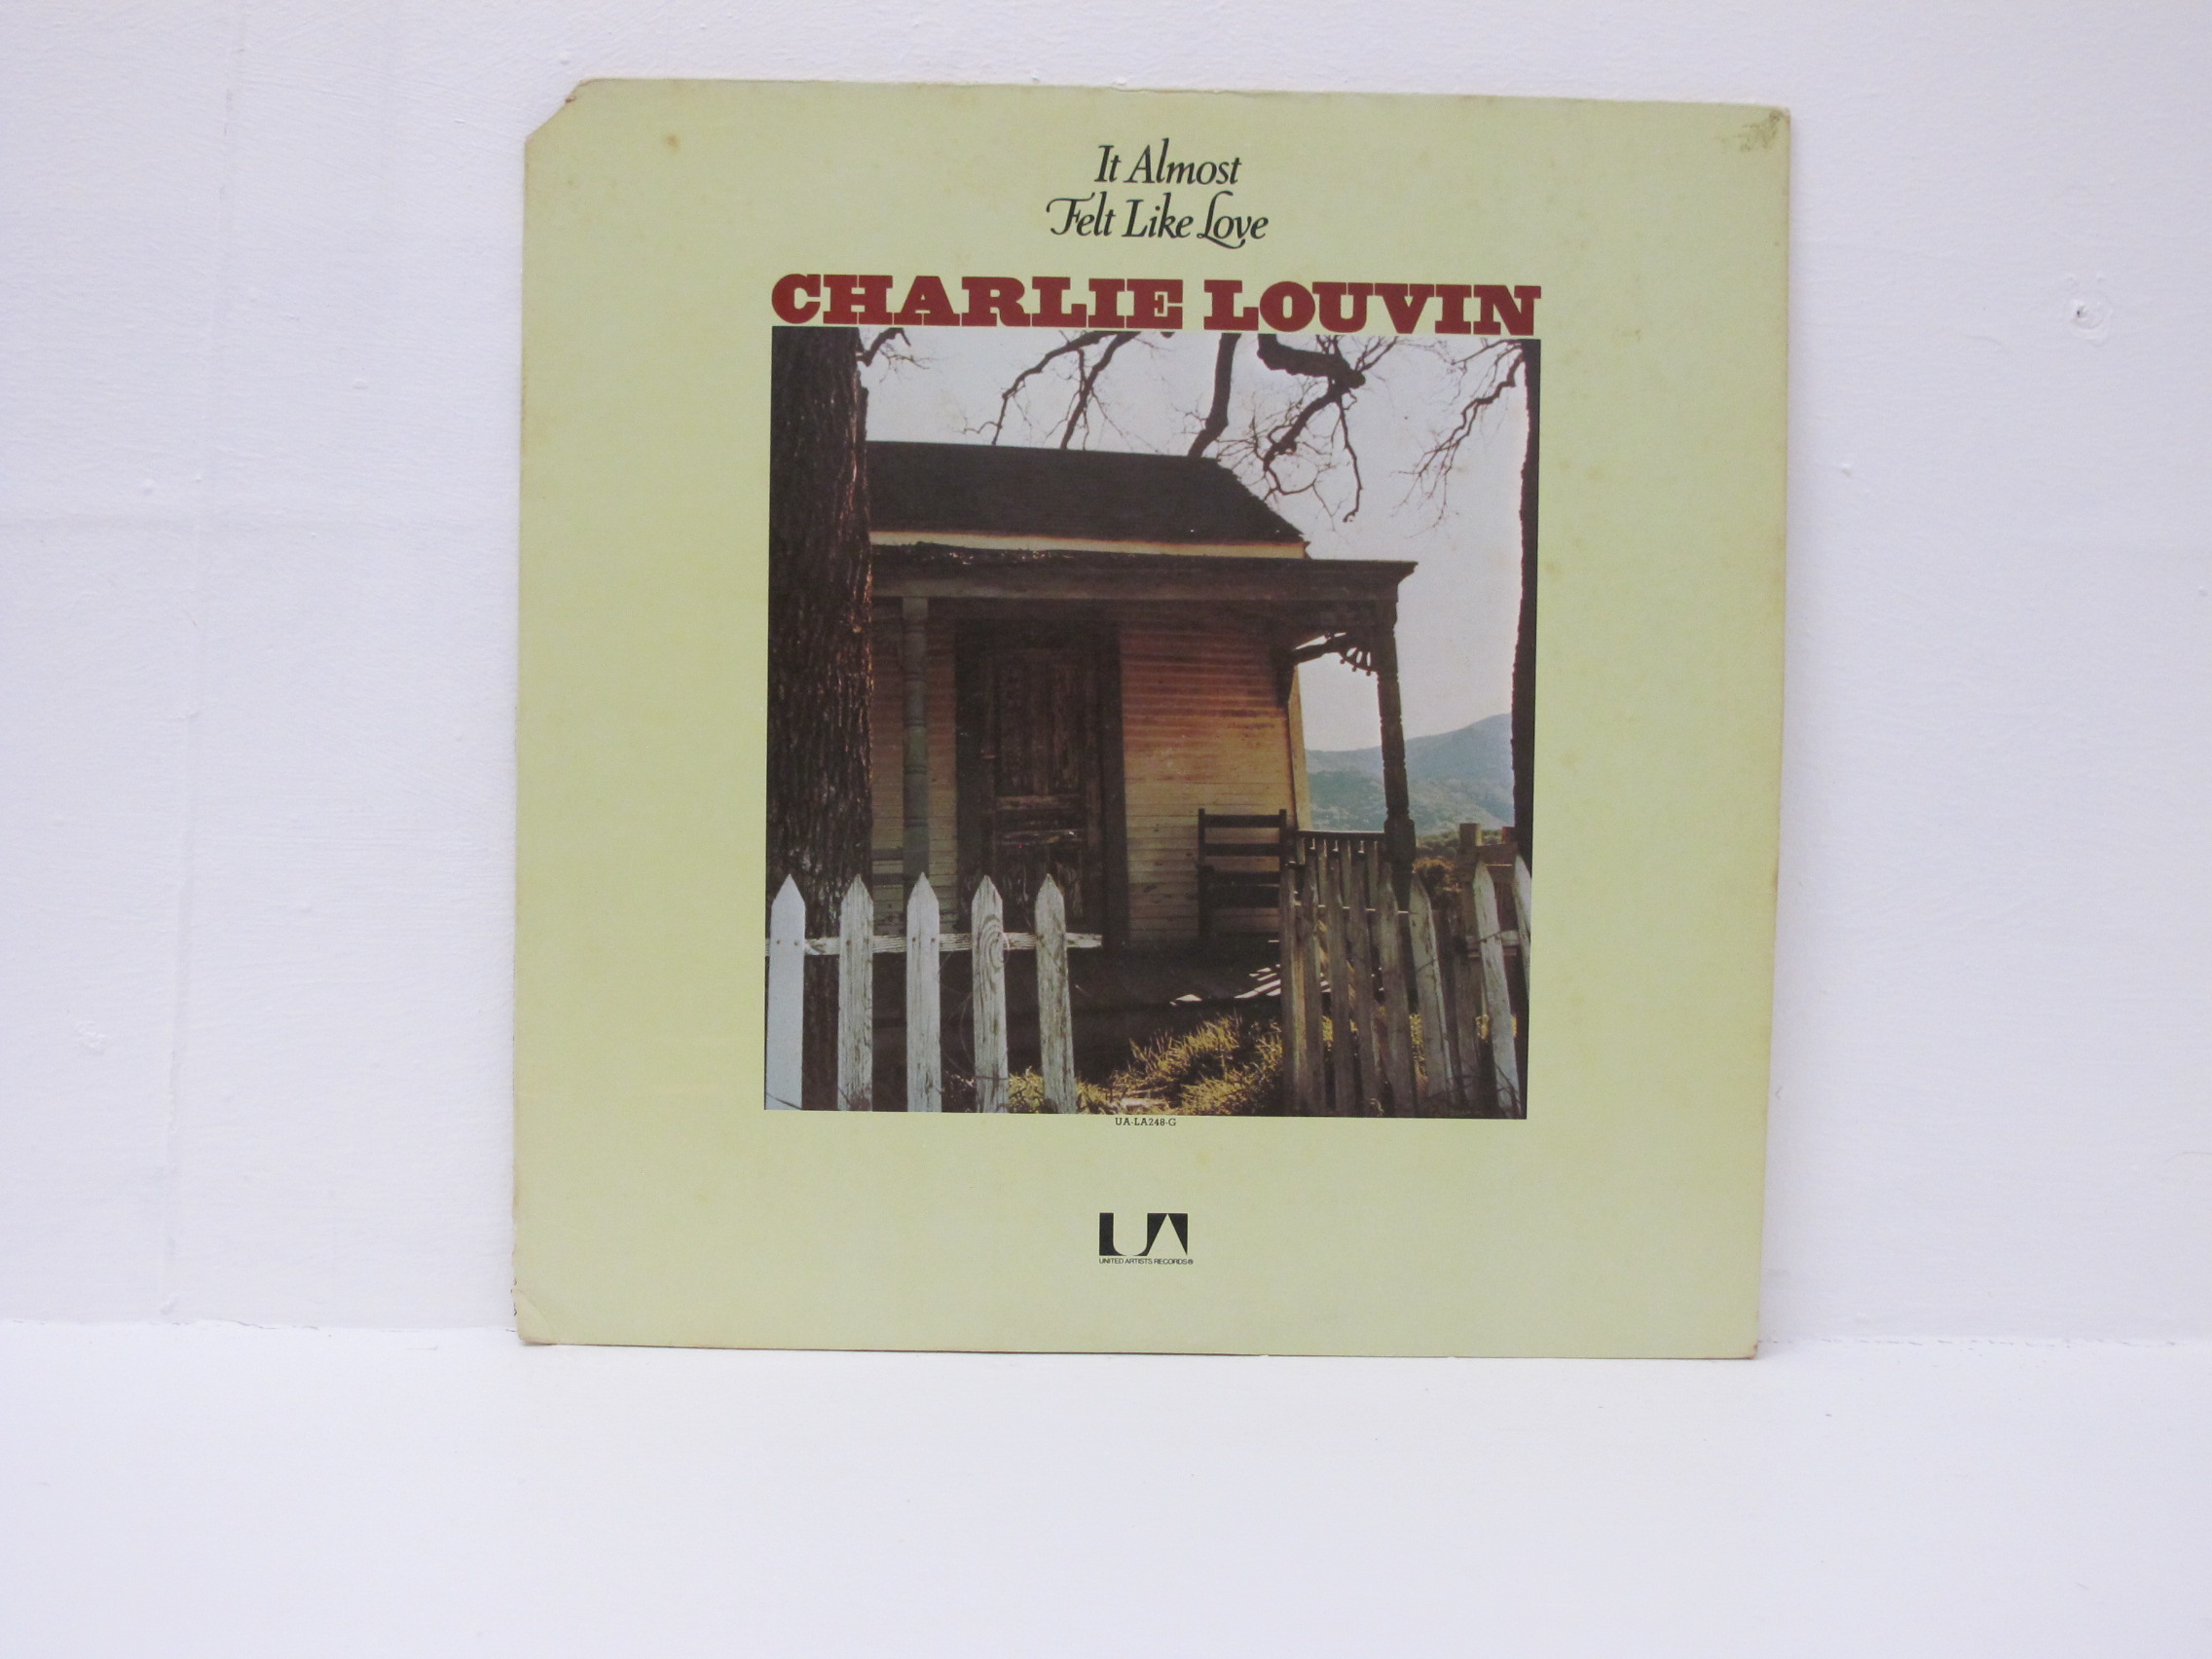 Charlie Louvin - It Almost Felt Like Love